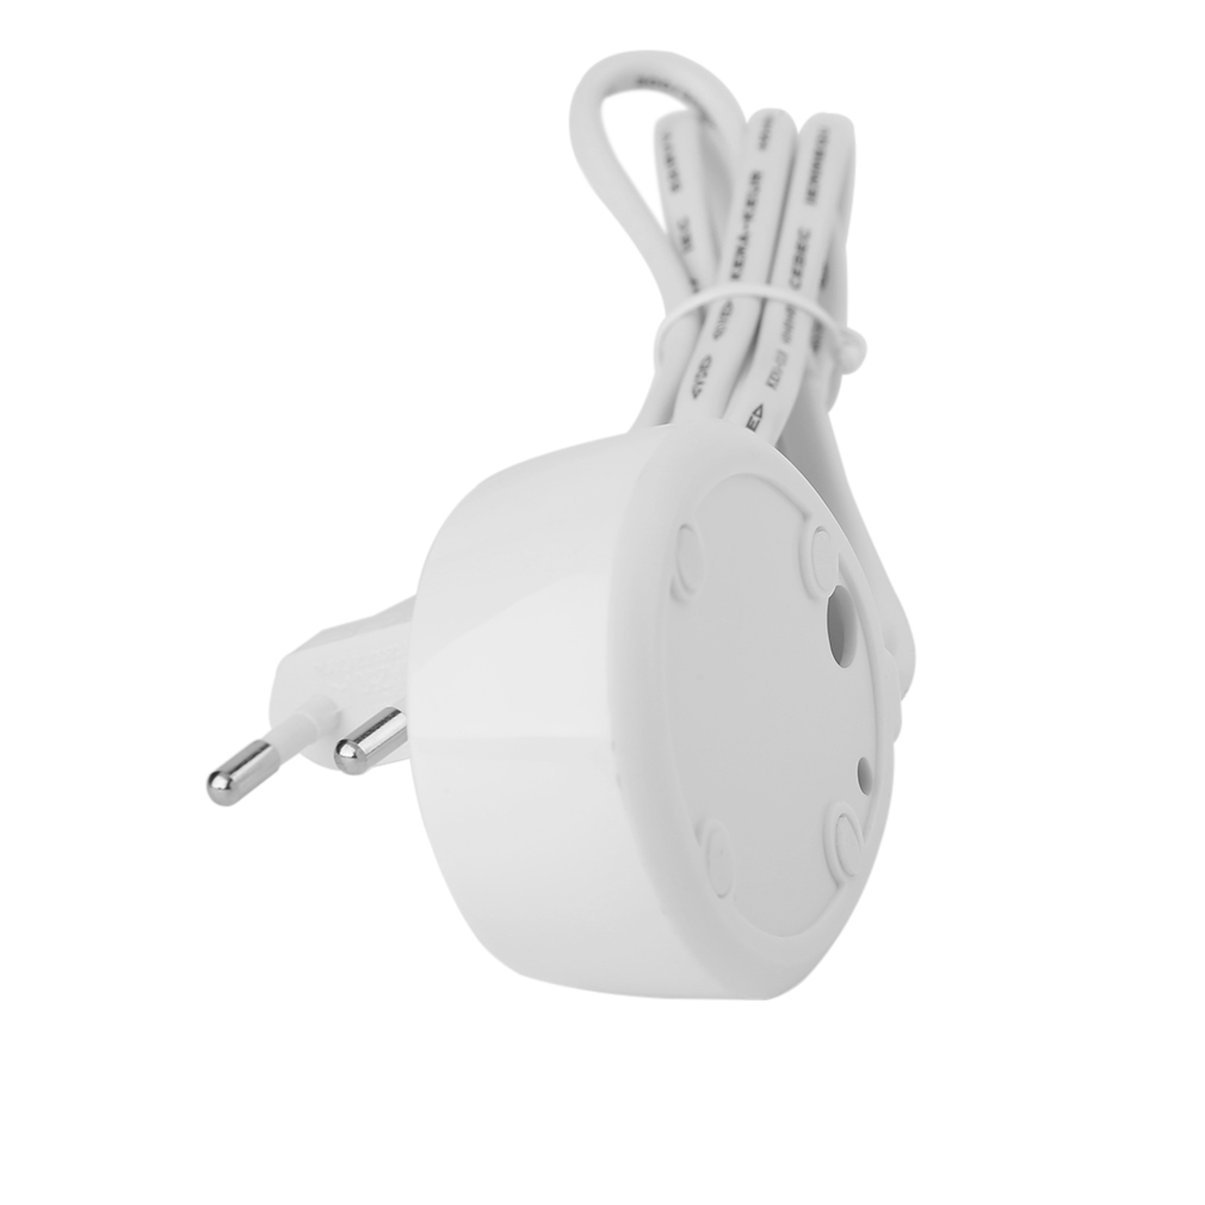 Braun Oral-B Cepillo de Dientes Cargador de Goteo, Cepillo de Dientes eléctrico Cargador, Cepillos de Dientes eléctricos Accesorios de Repuesto para ...